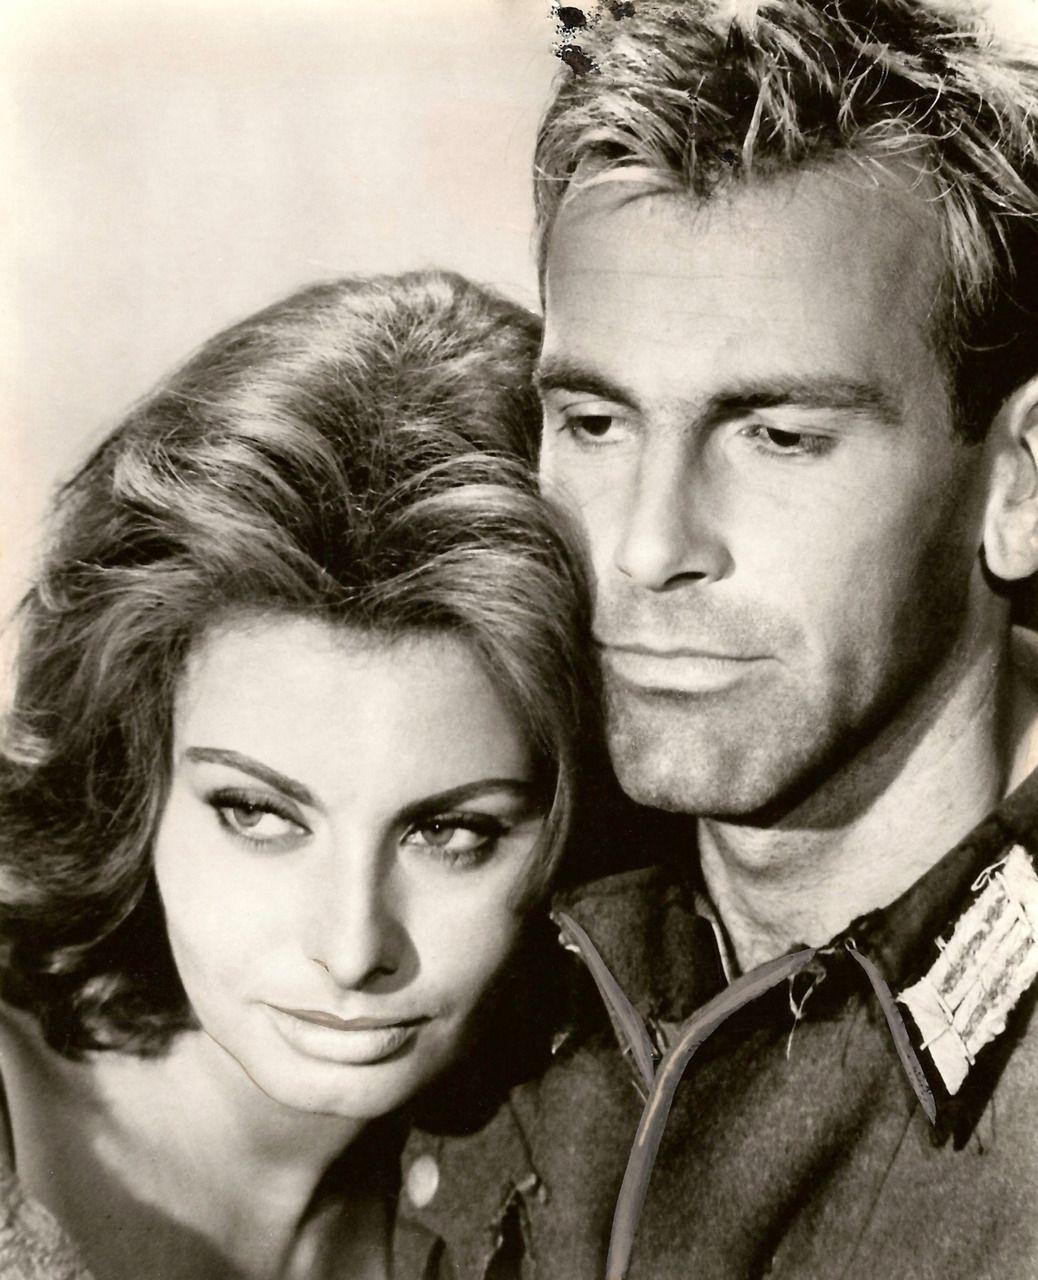 Sophia Loren & Maximilian Schell in The Condemned of Altona (1962)